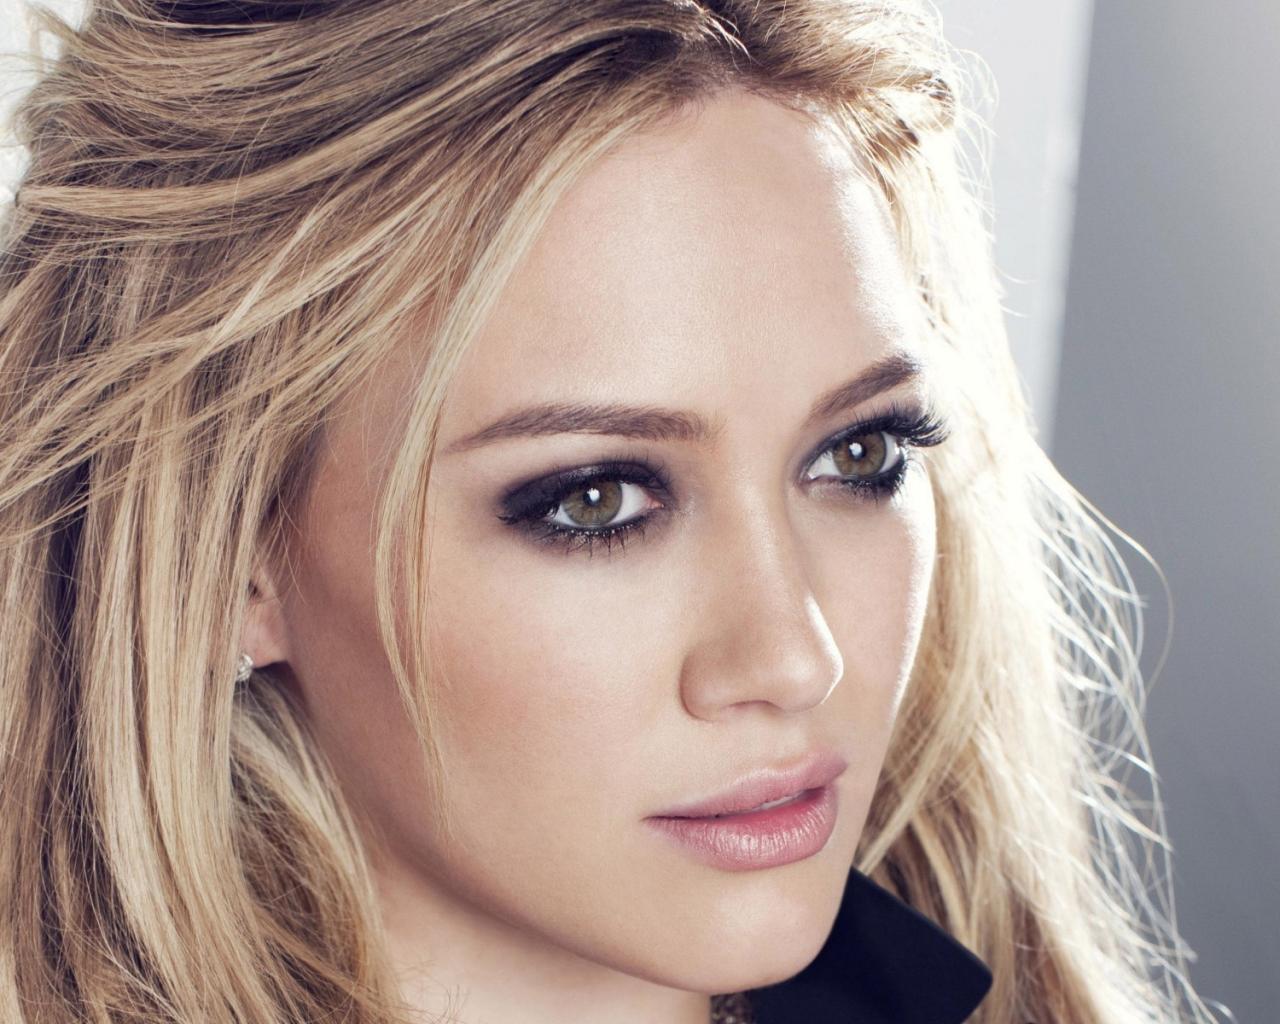 Хилари Дафф, Hilary Duff обои для рабочего стола, картинки ... хилари дафф